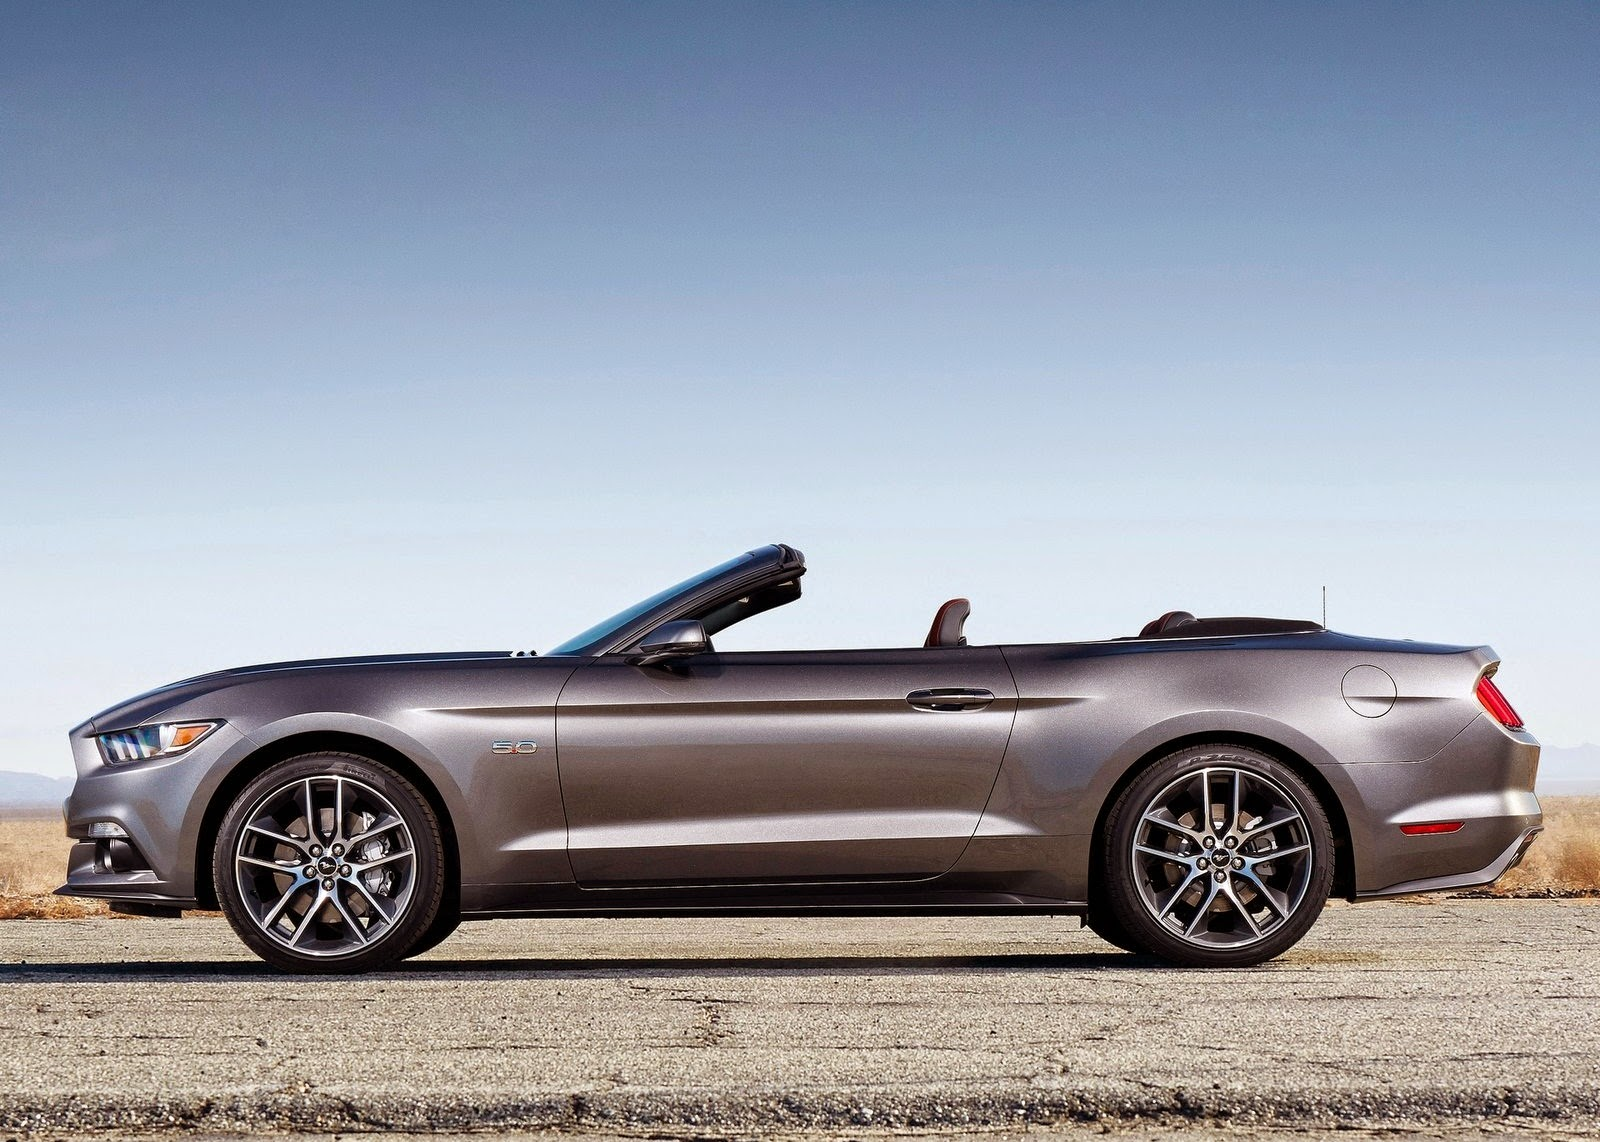 2015 Ford Mustang Convertible Hd Car Wallpaper Car